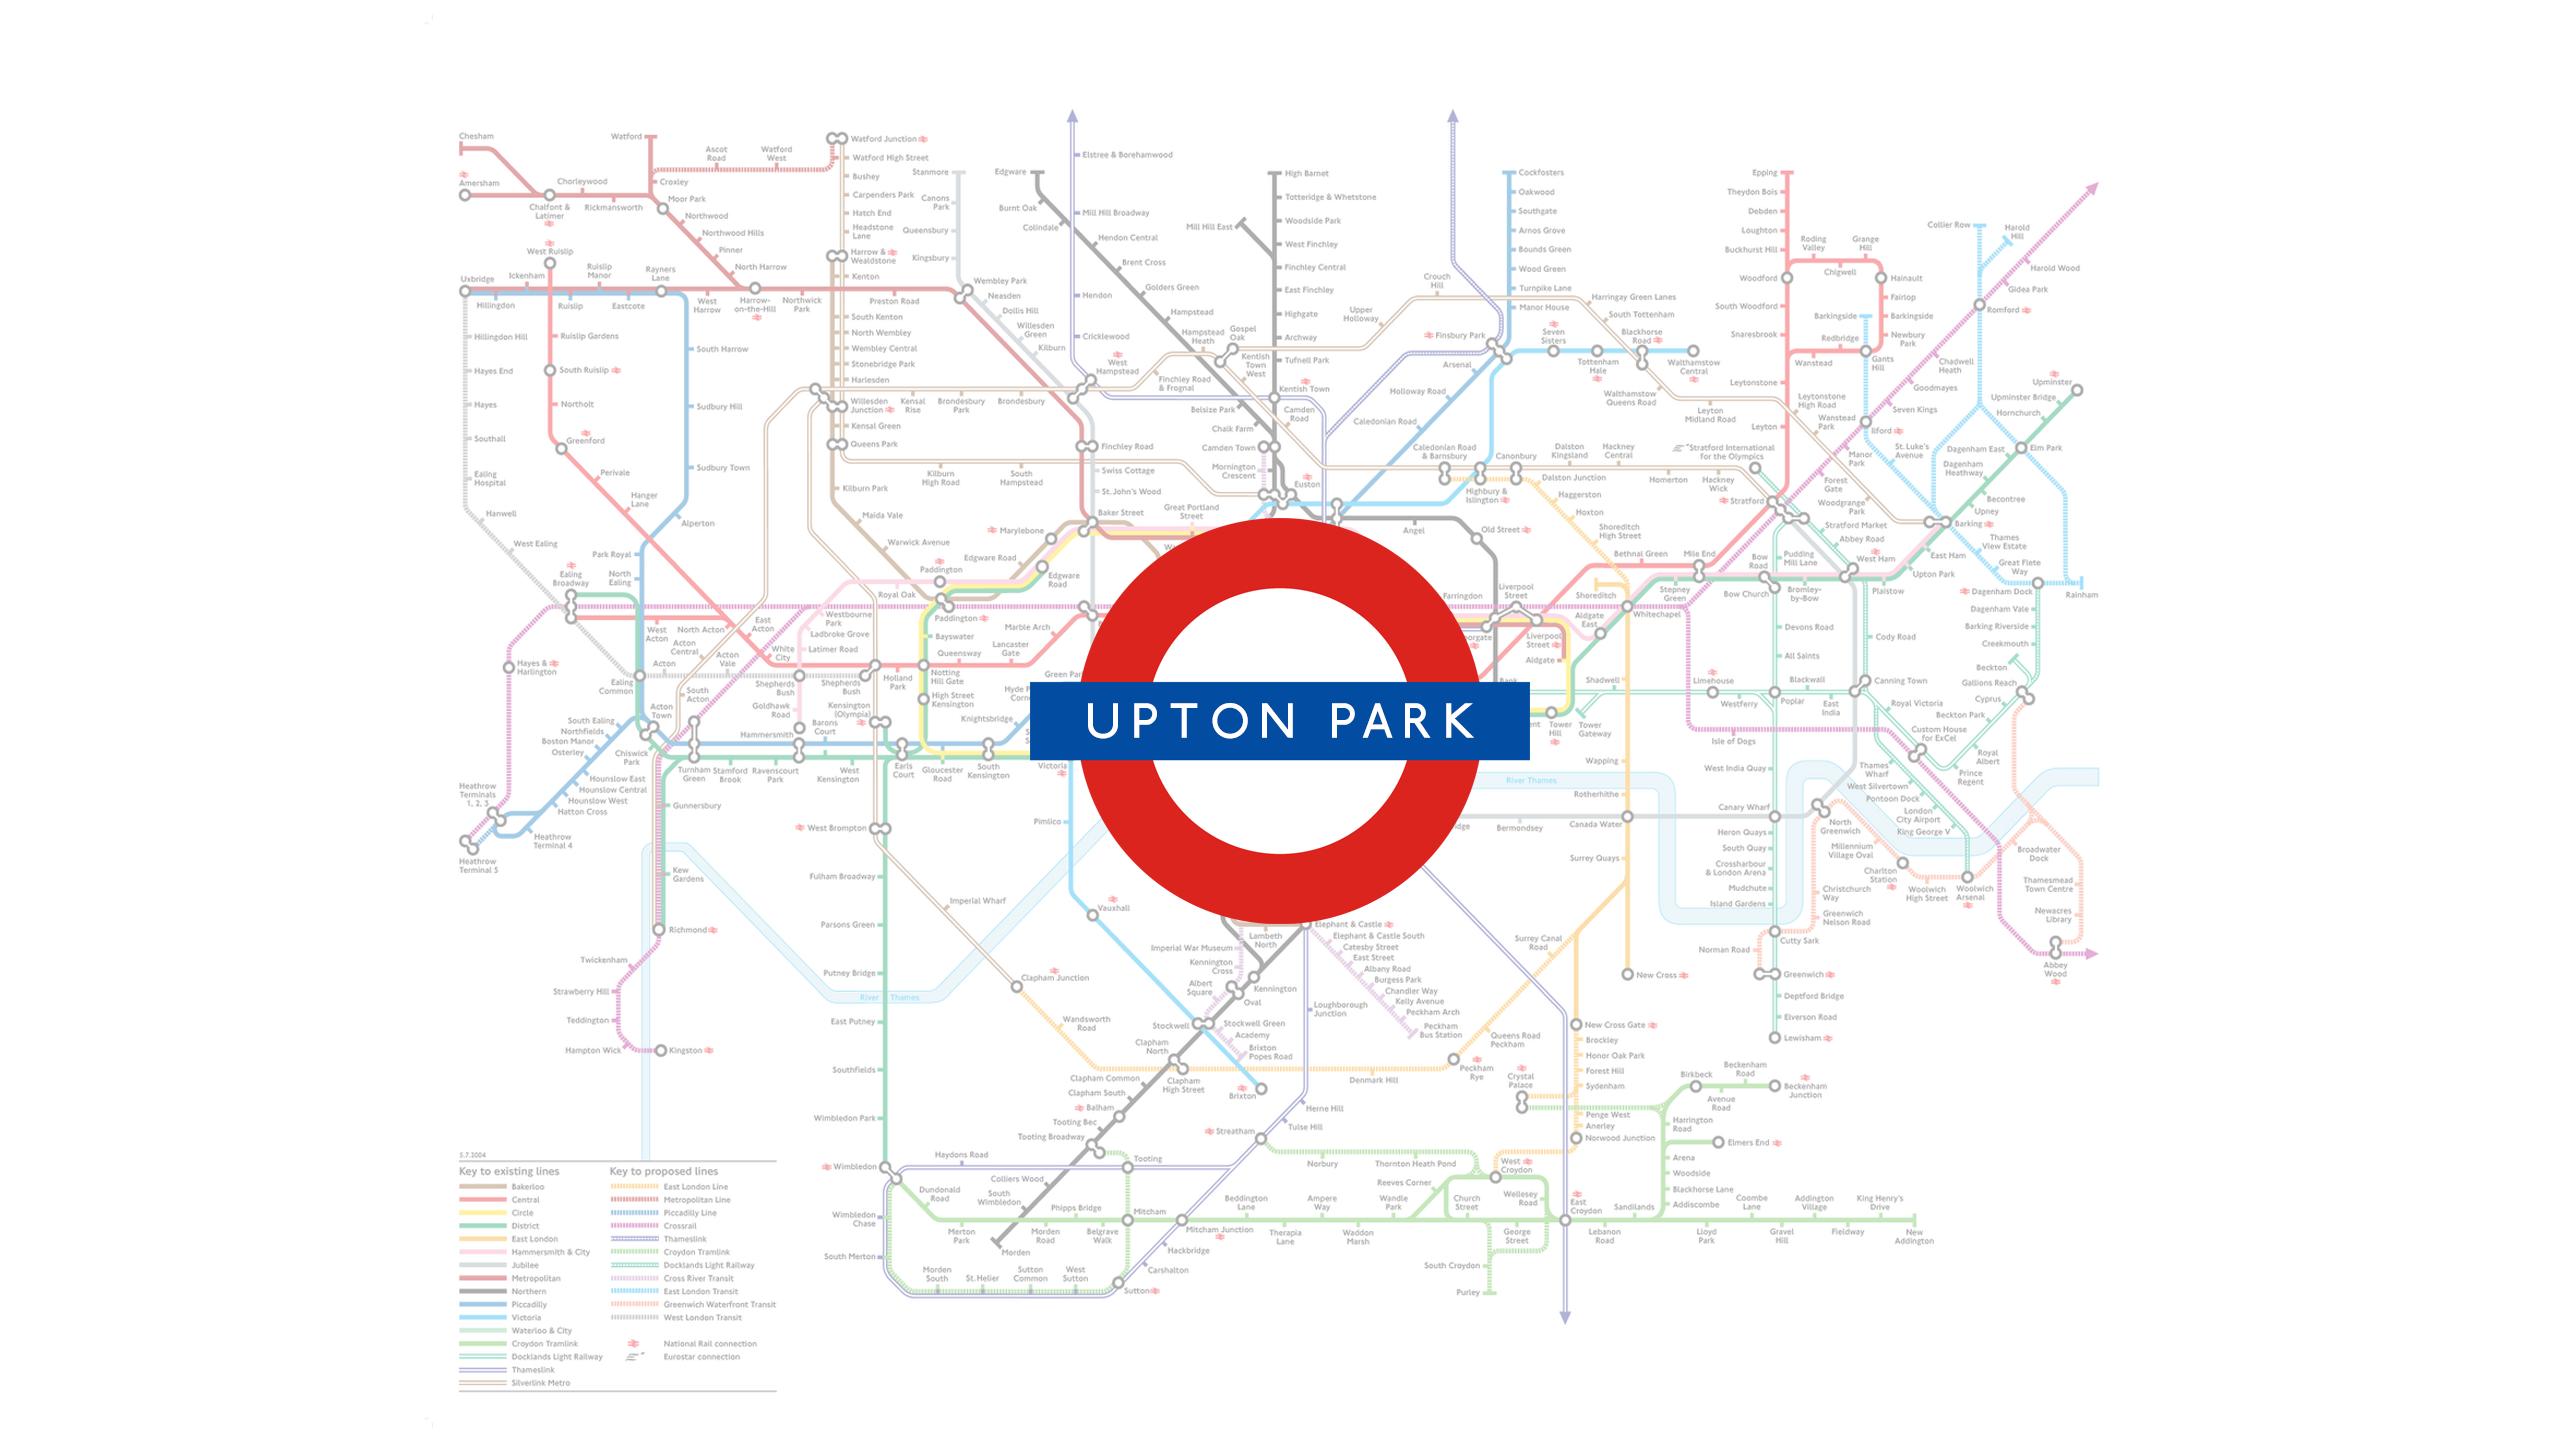 Upton Park (Map)